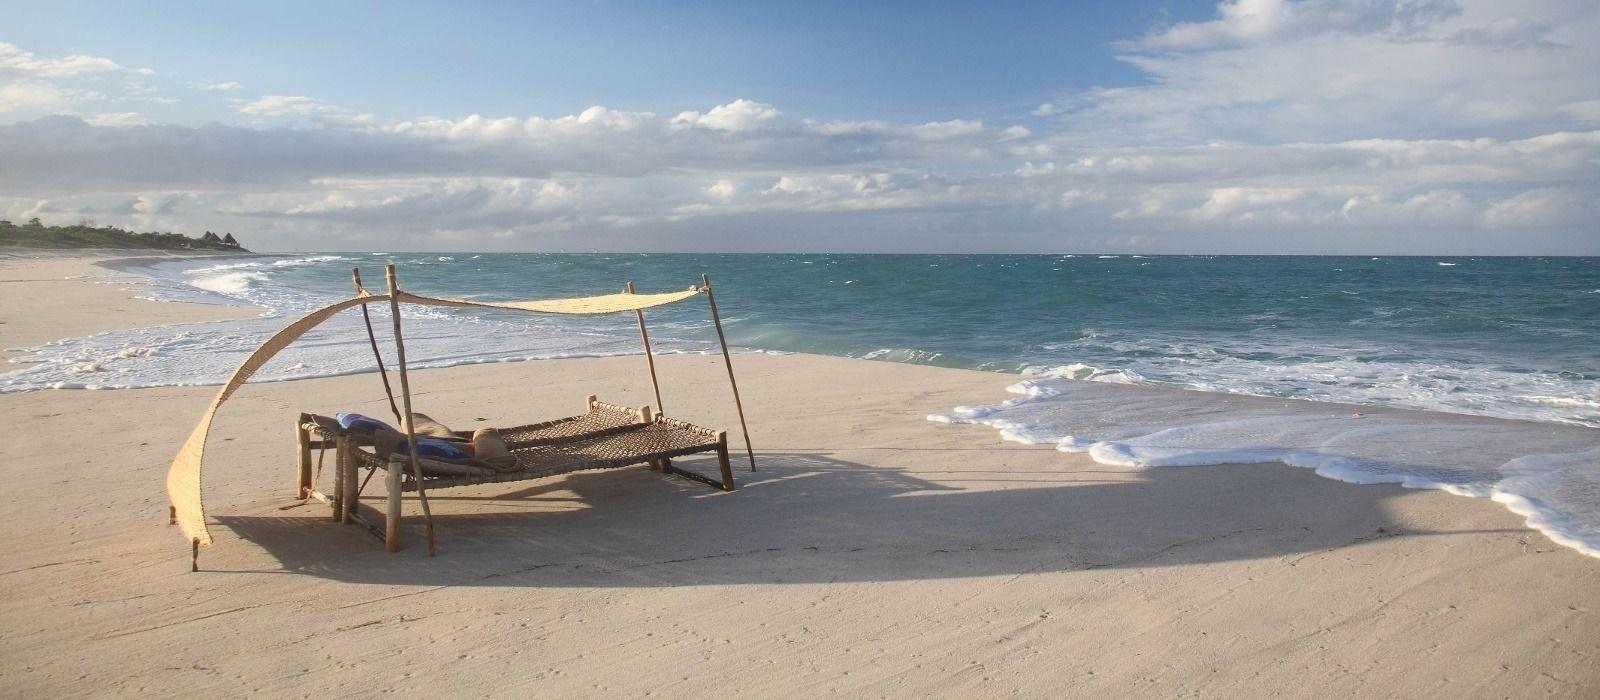 Tansania: Wahre Wildnis, unberührtes Juwel & Inselparadies Urlaub 1